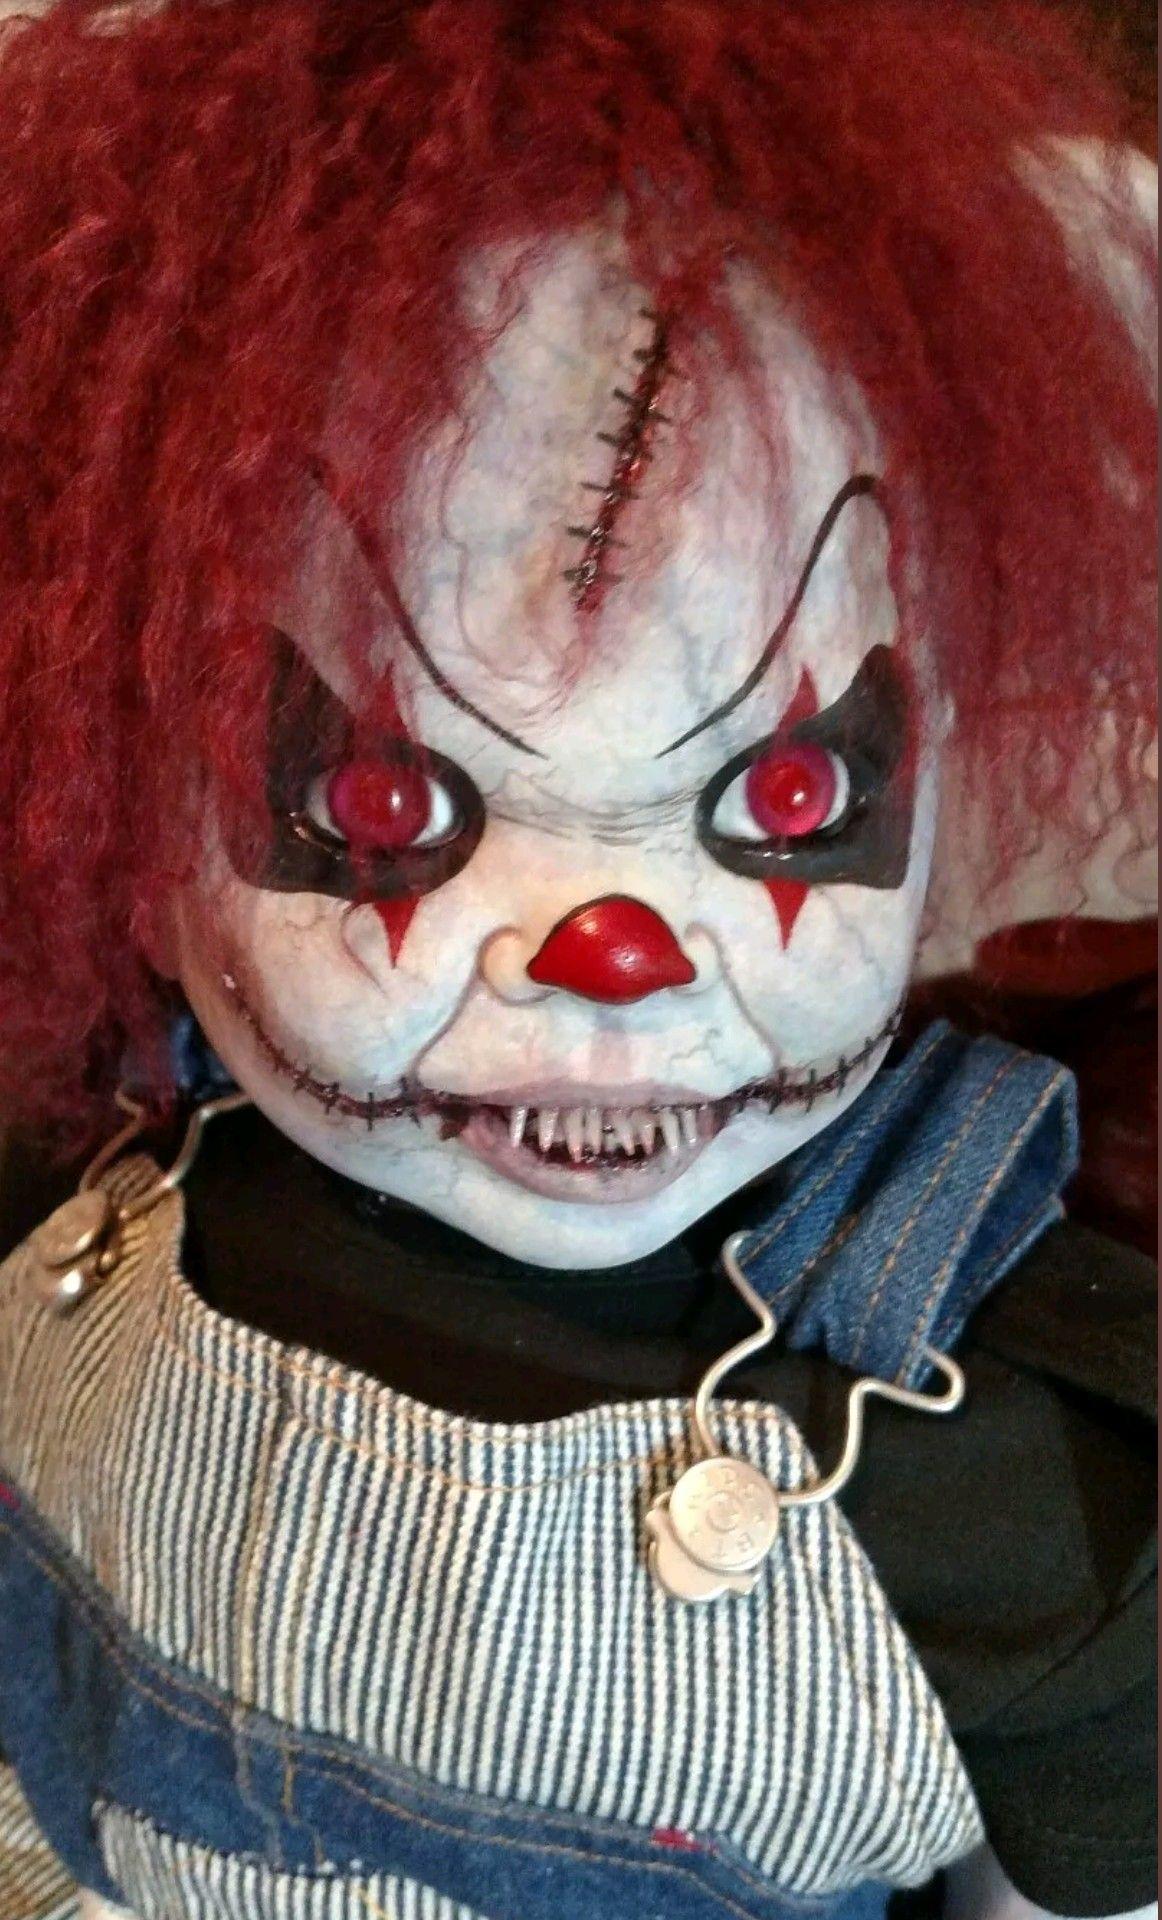 creepy cool clown doll | halloween in 2018 | creepy dolls, creepy